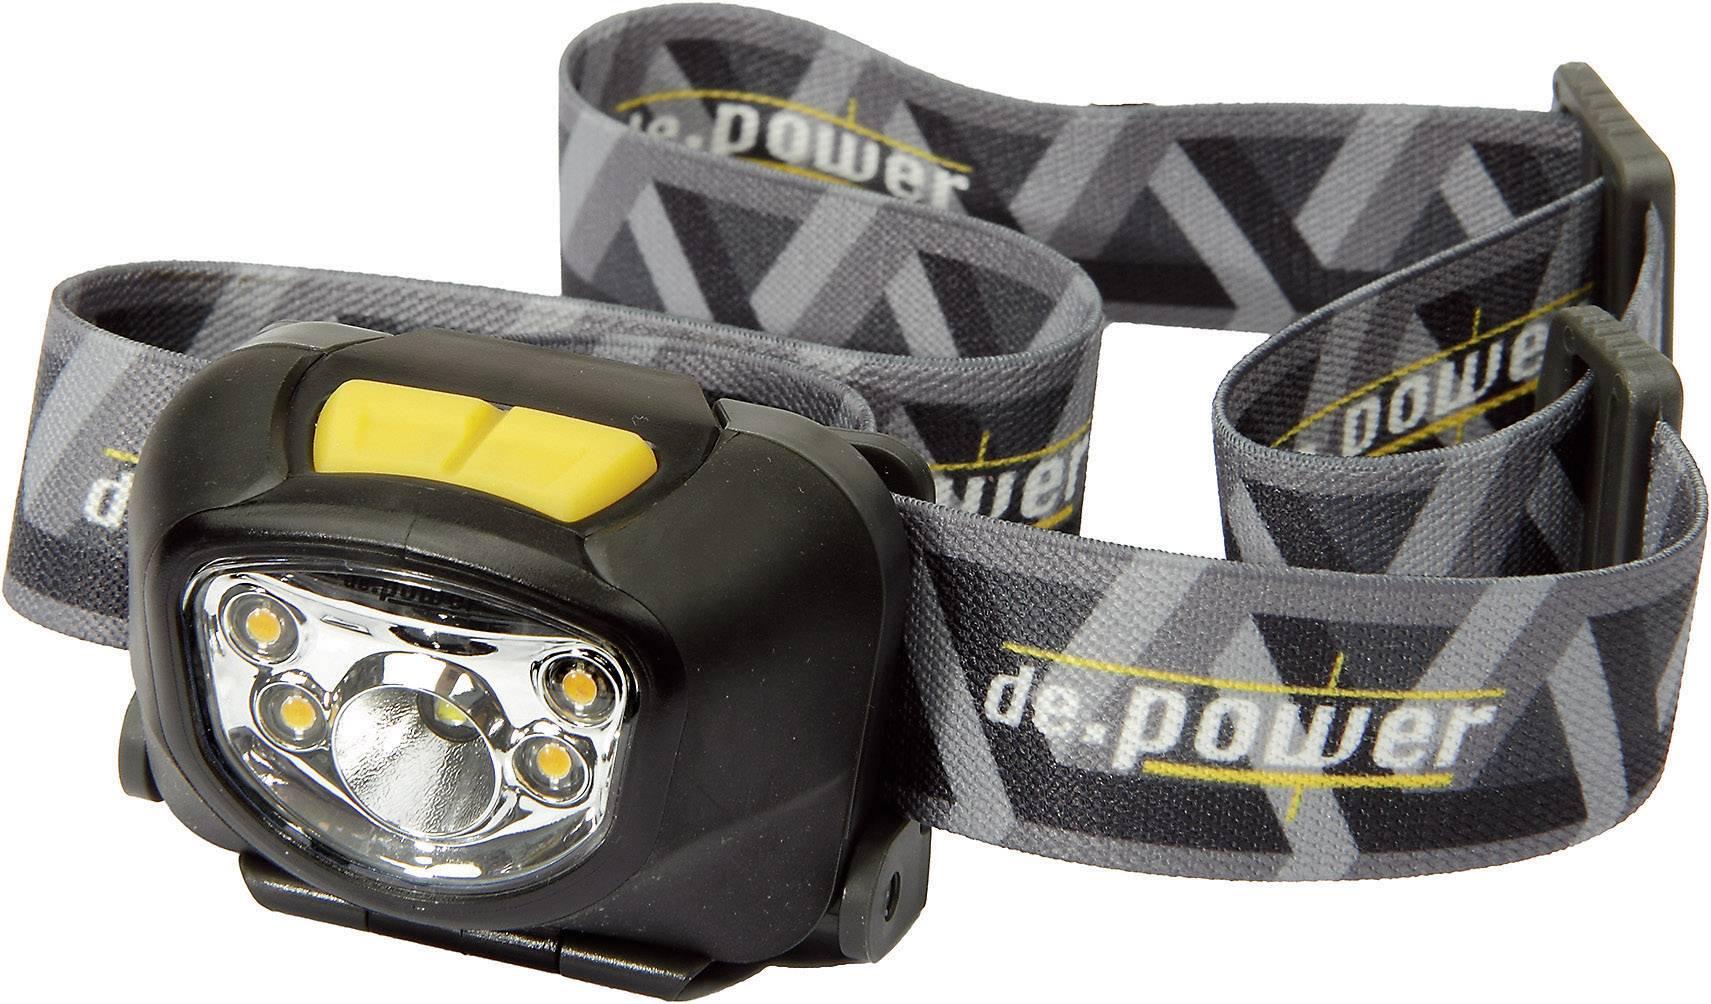 LED čelovka de.power by litexpress DP-801 DP-801AAA-C, na batérie, 95 g, čiernosivá